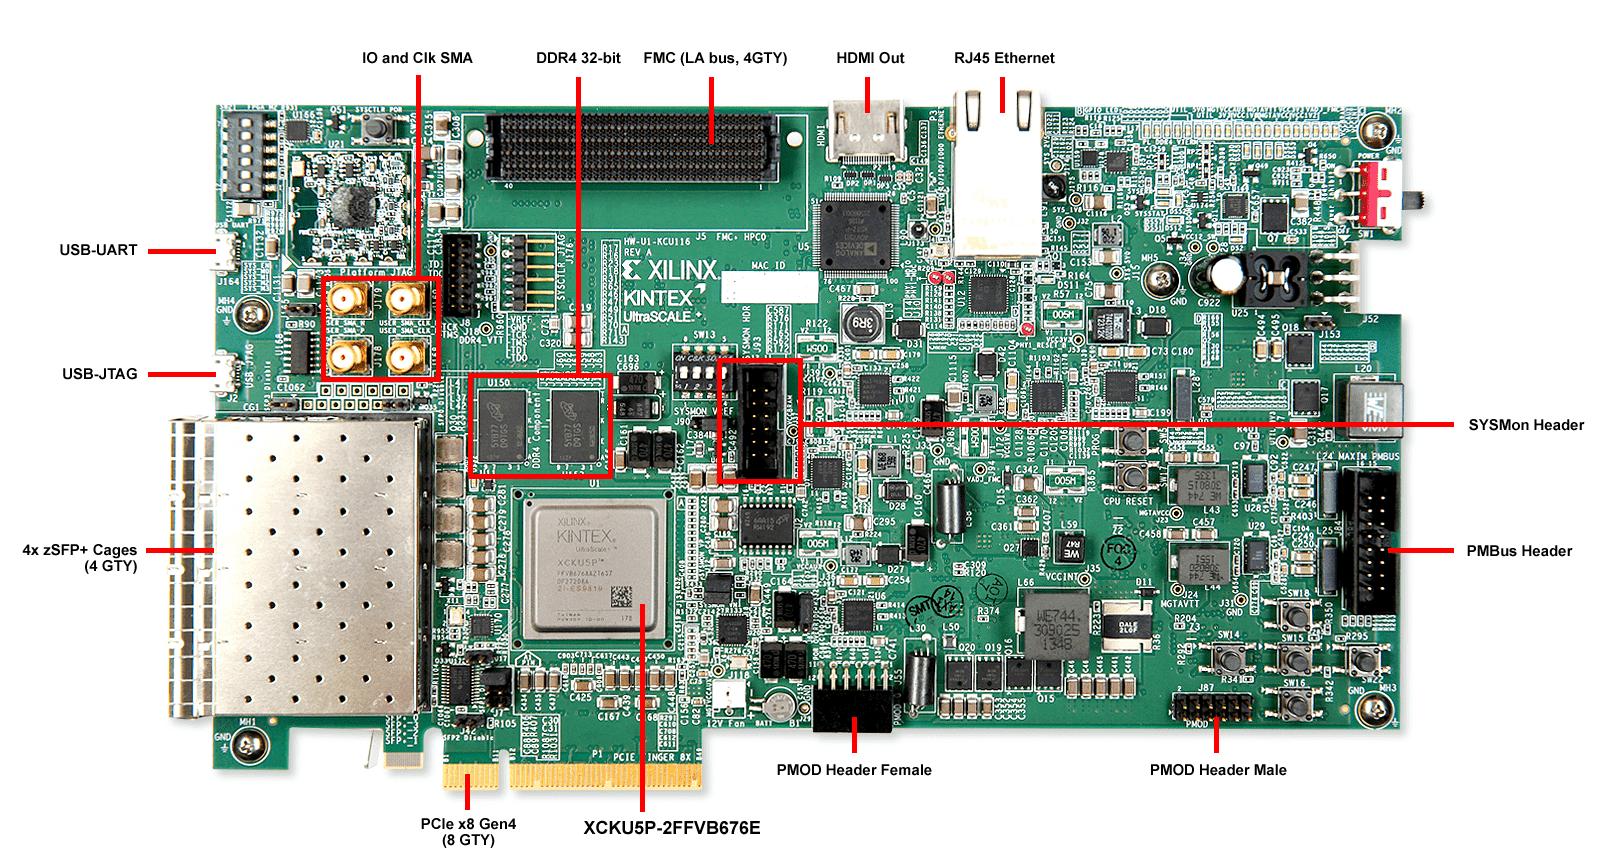 Xilinx Kintex UltraScale+ FPGA KCU116 Evaluation Kit